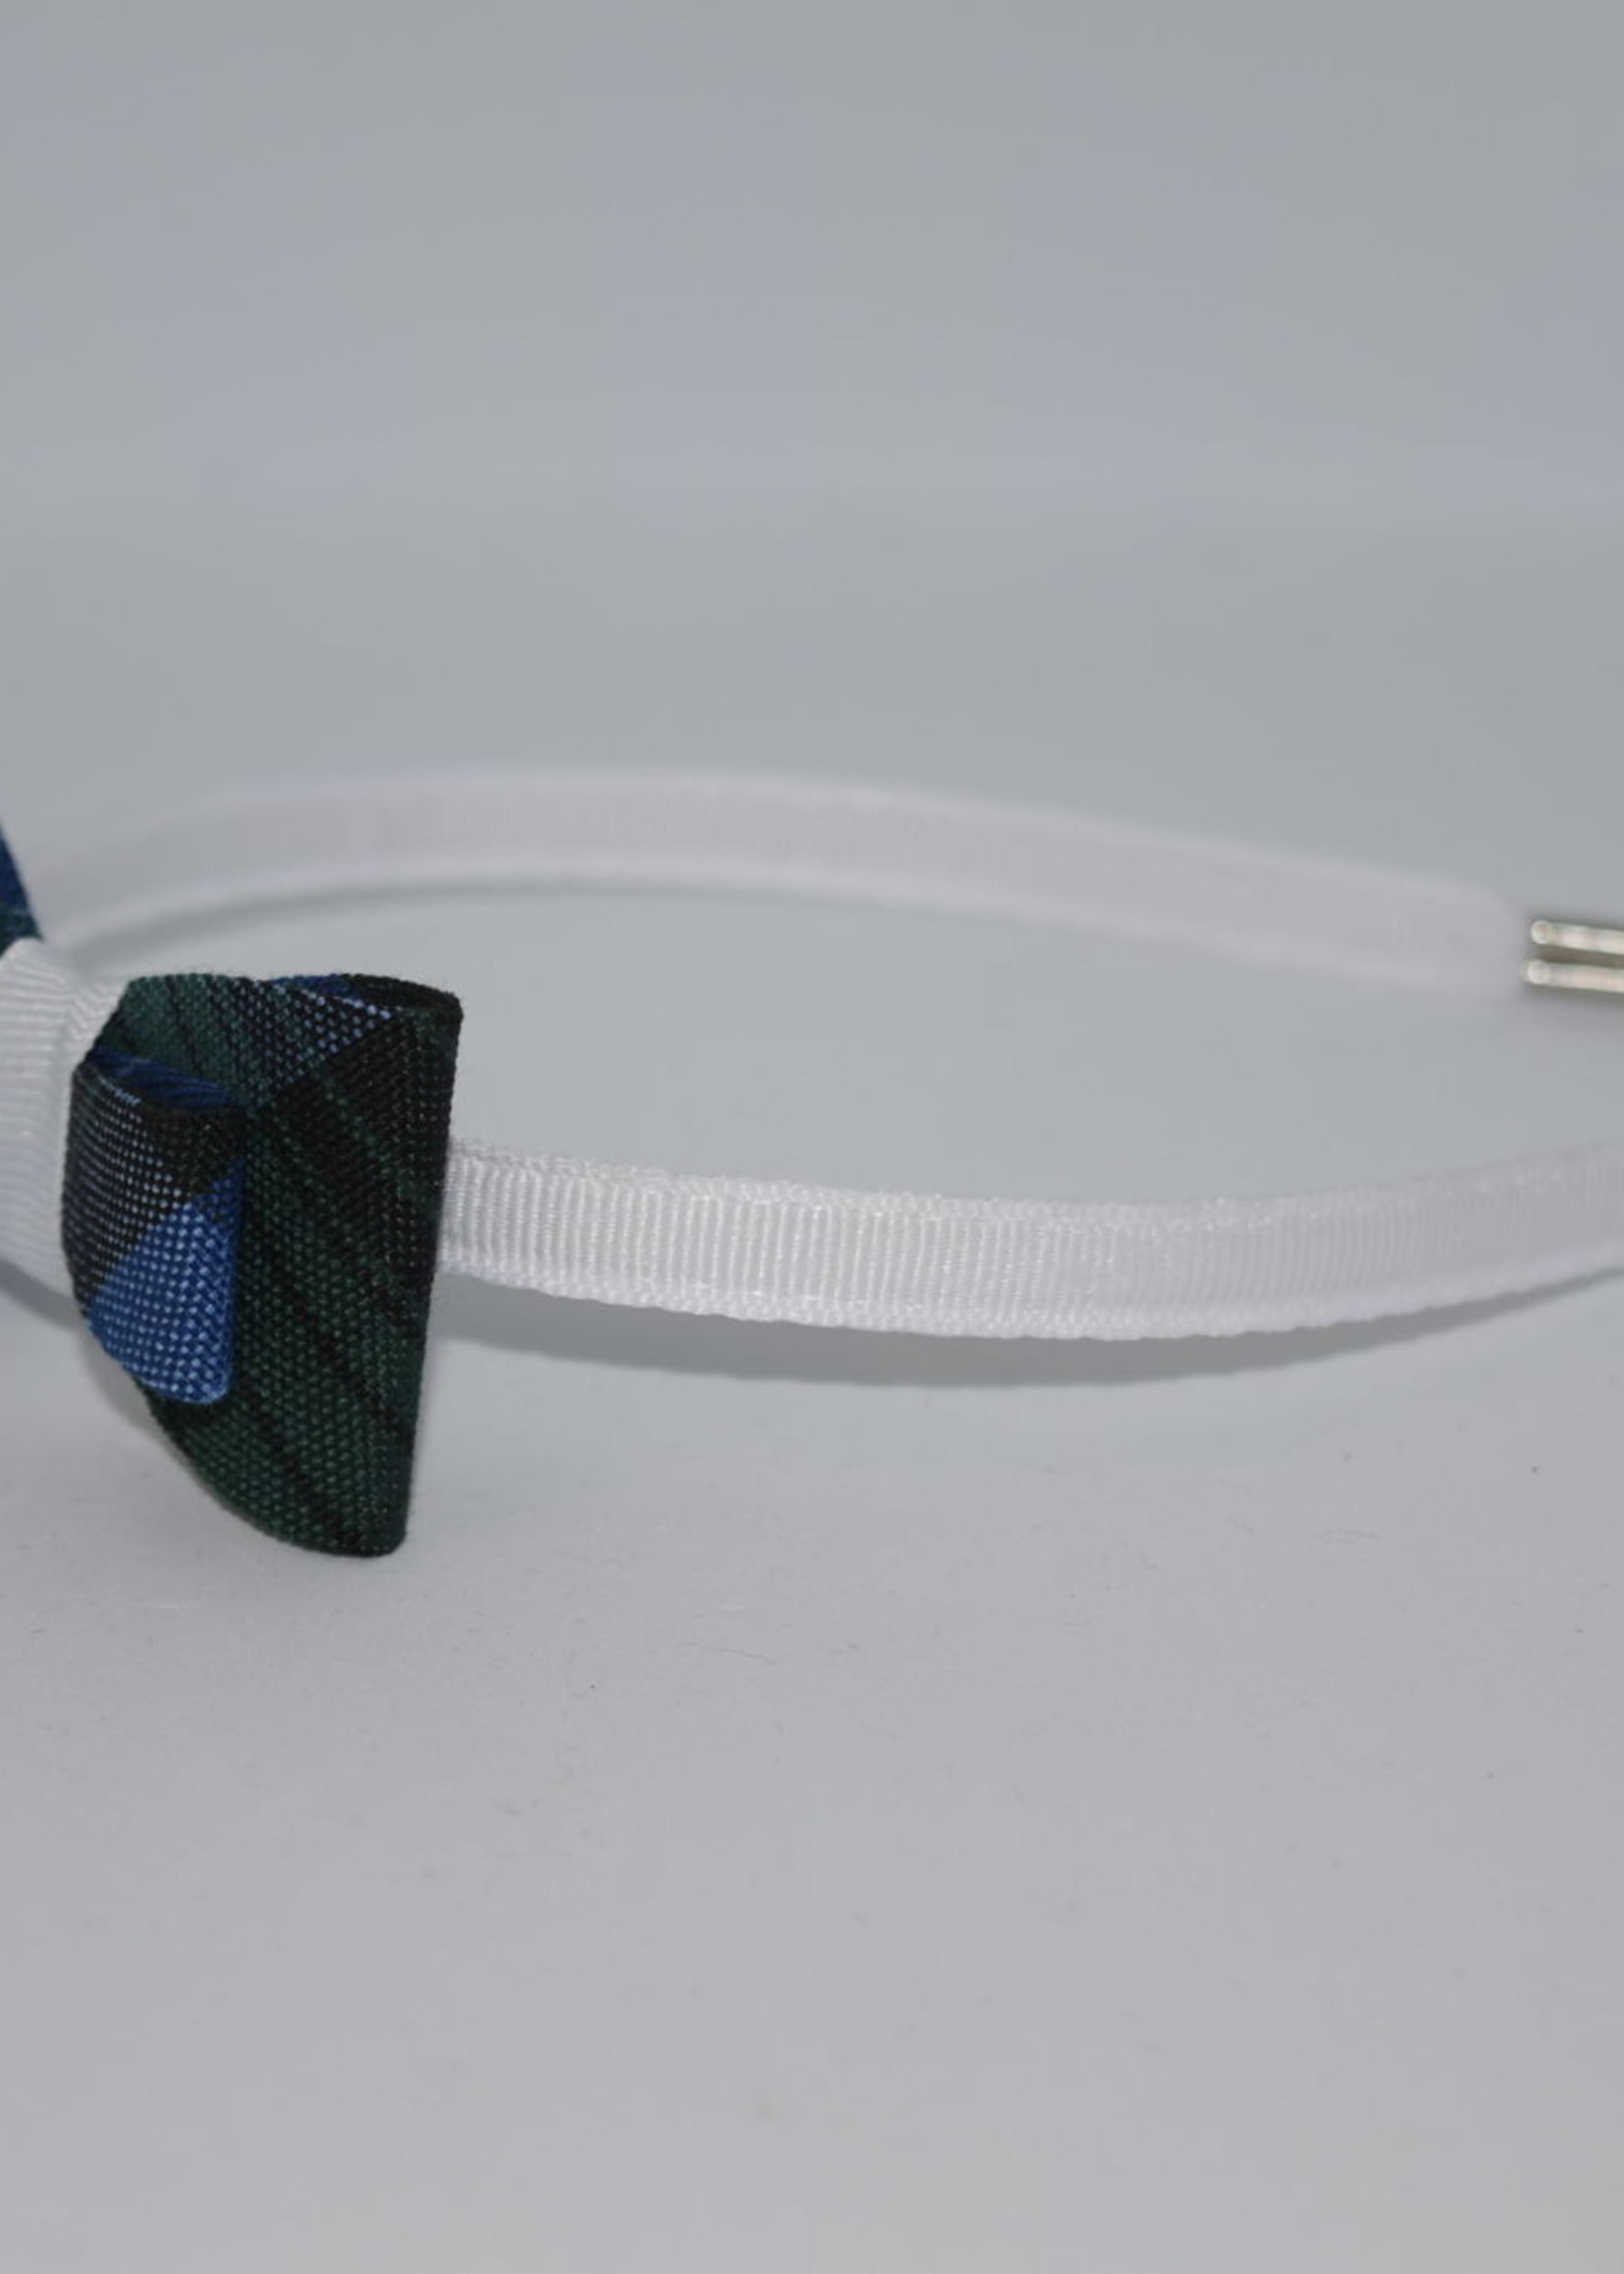 EDT Double Tailored Ponytail Bow on Headband P46 WHT